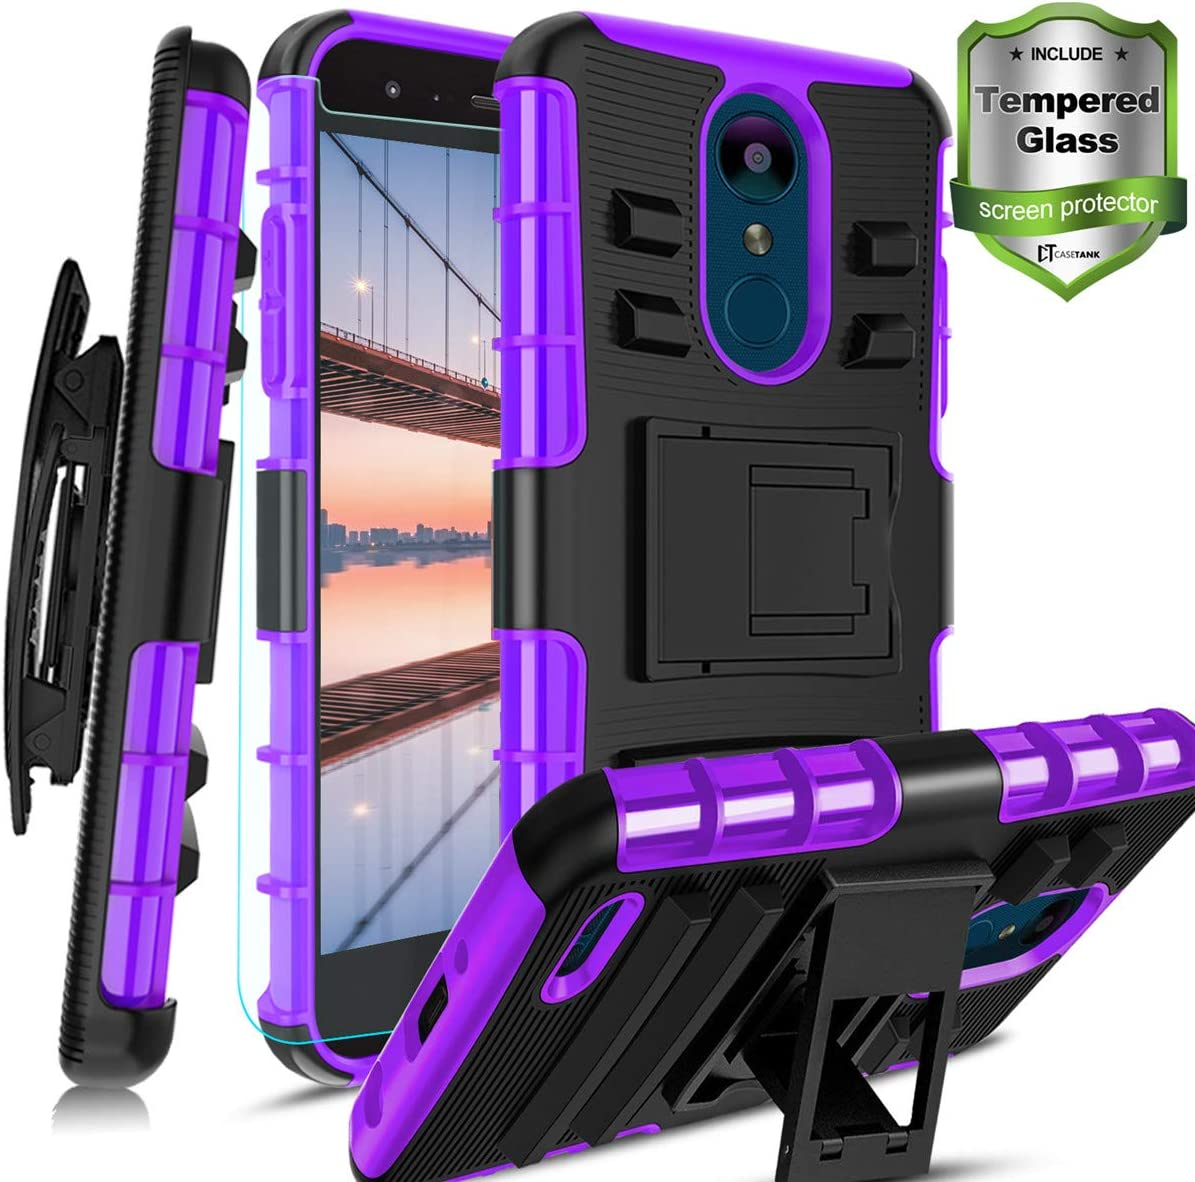 LG Aristo 2/LG Rebel 4 Case/Aristo 2 Plus/Phoenix 4/Zone 4/K8(2018)/Fortune 2/Risio 3/Tribute Dynasty/K8+/Rebel 4 LTE W [Tempered Glass Screen Protector] Built-in Kickstand Belt Clip Holster, Purple